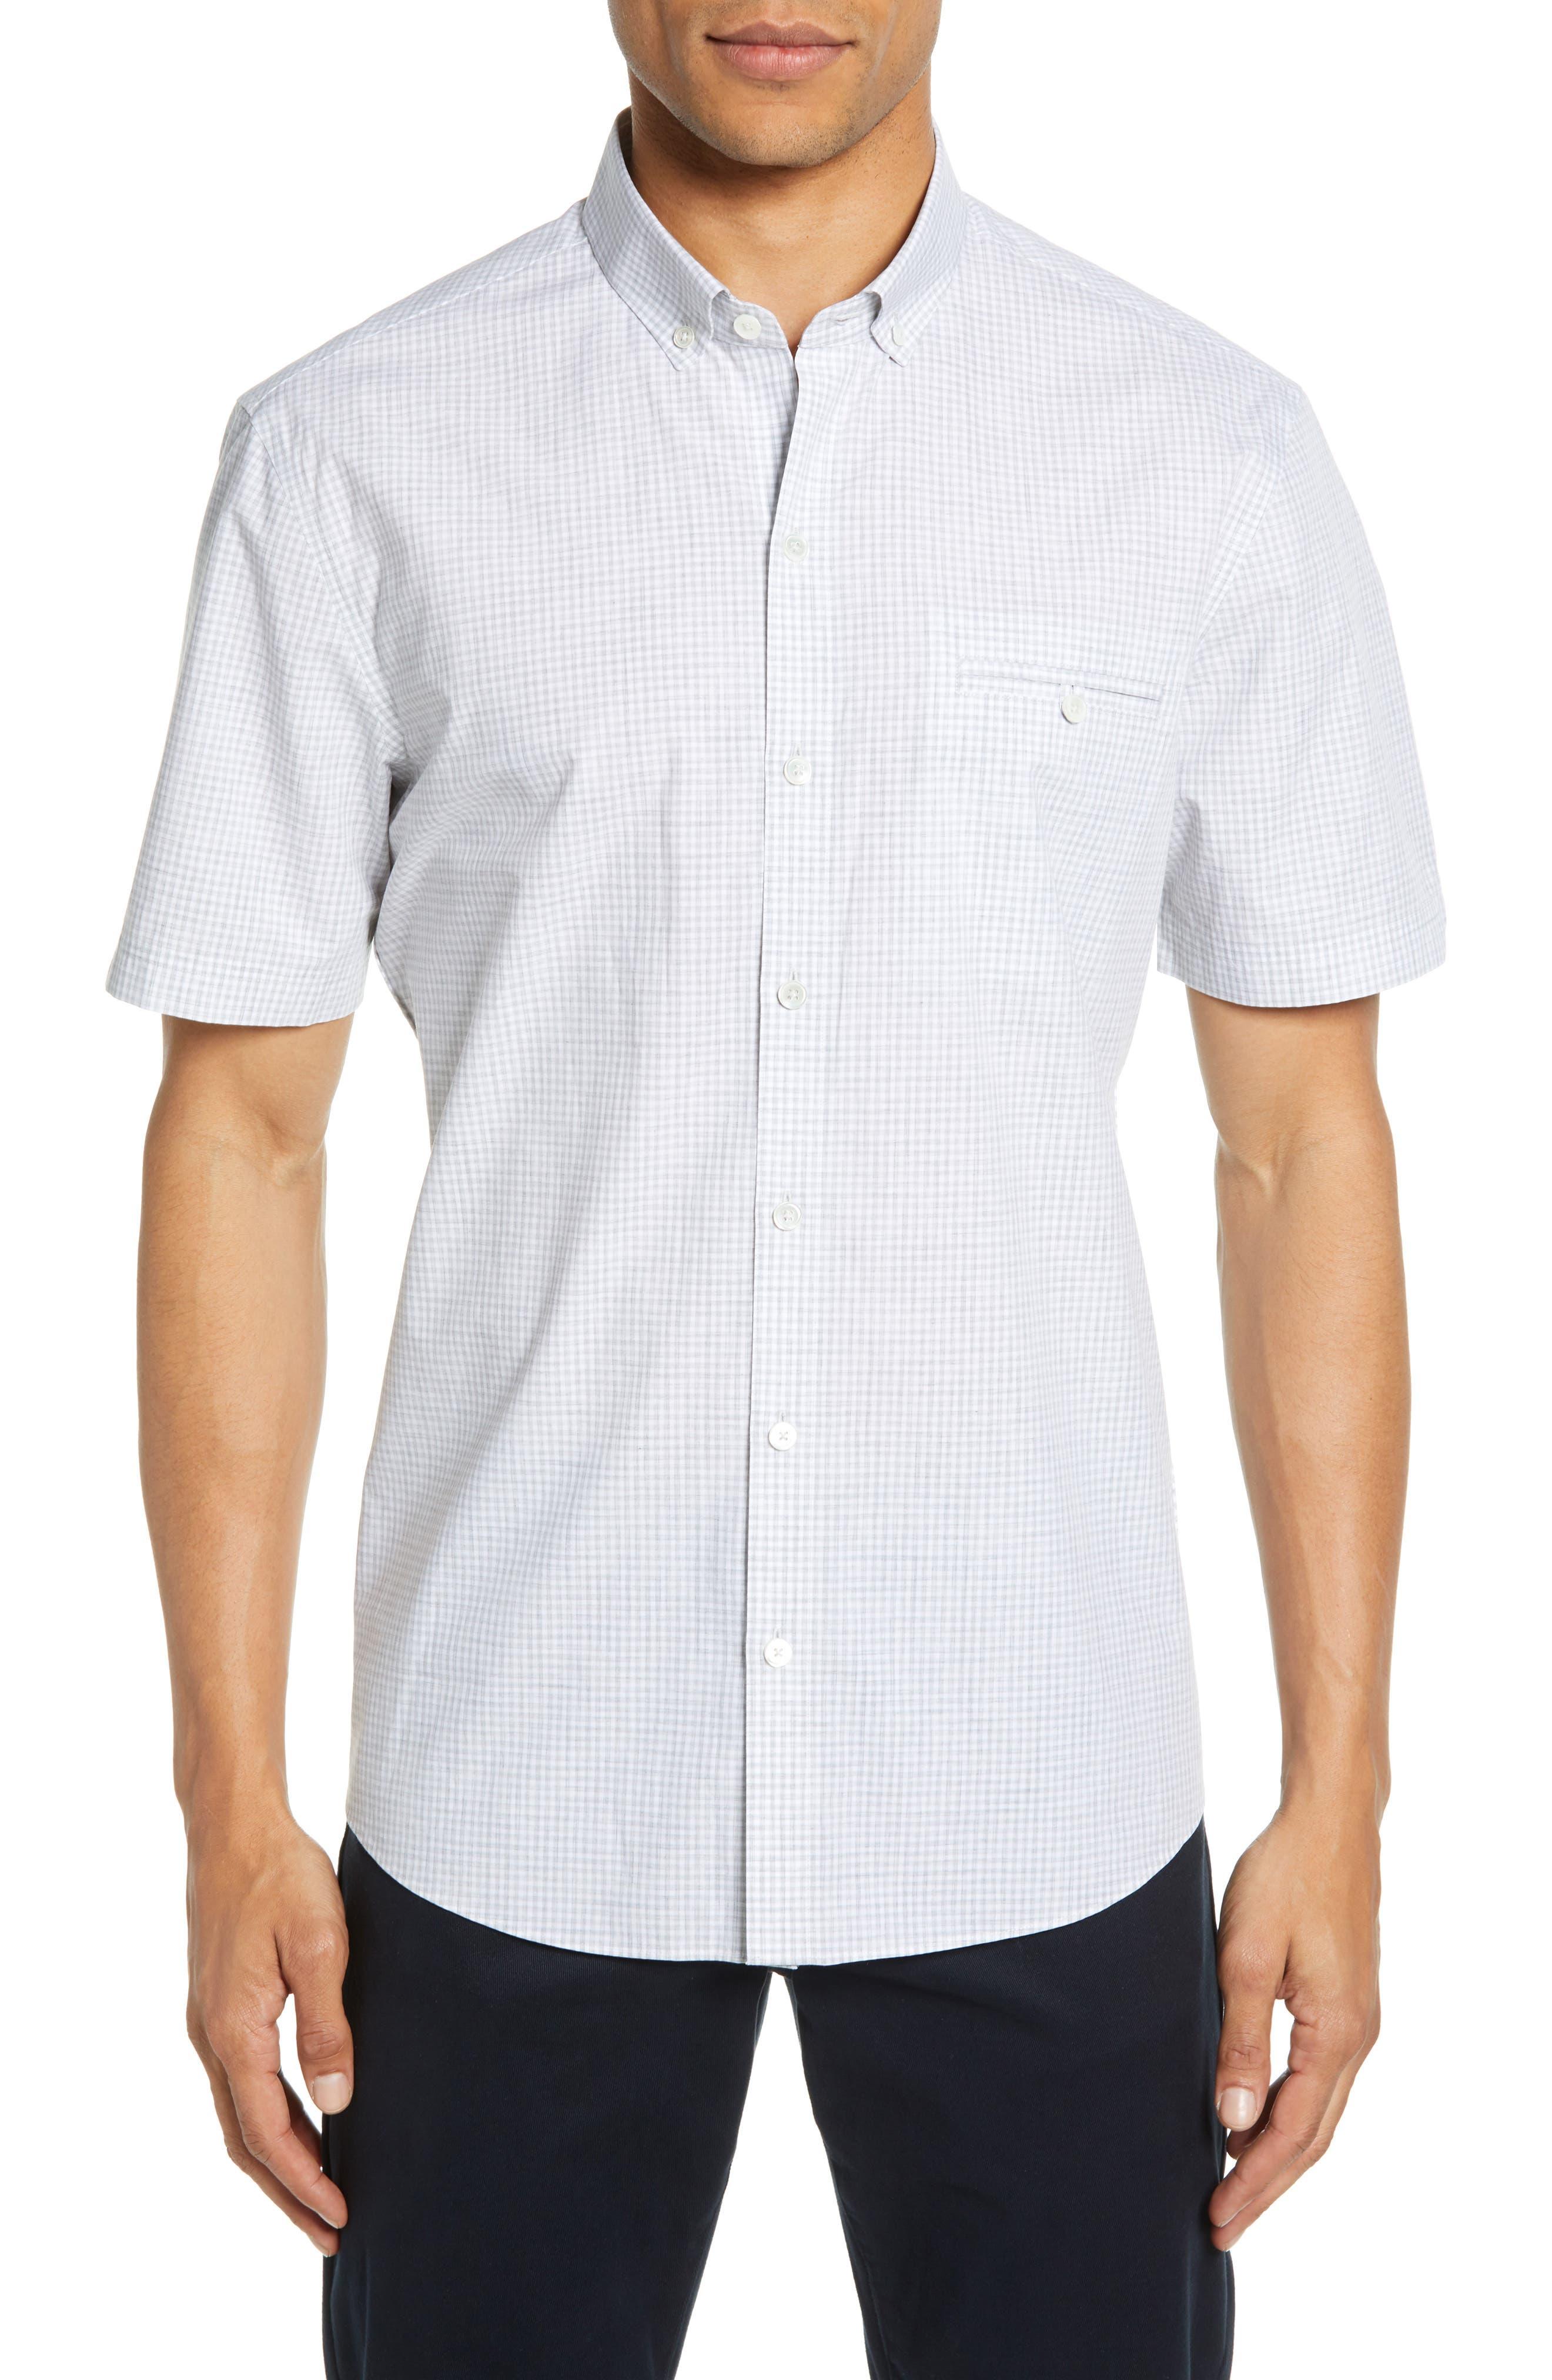 ZACHARY PRELL, Cechini Regular Fit Short Sleeve Sport Shirt, Main thumbnail 1, color, LT GREY